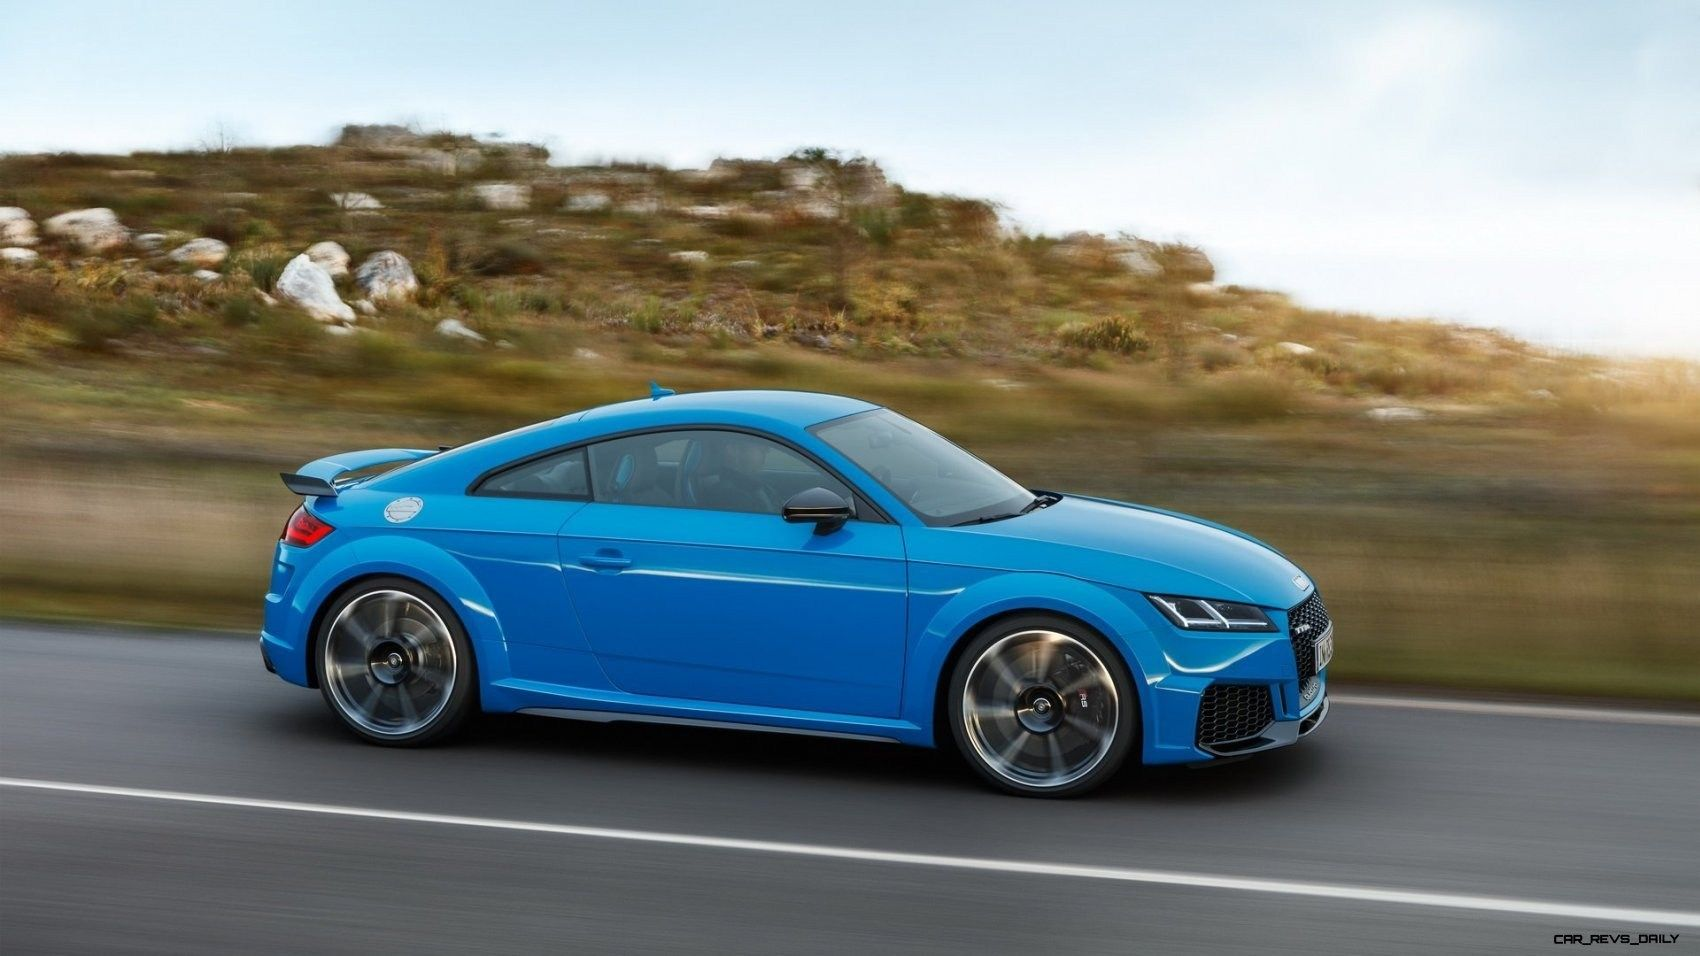 2020 Tt Rs 7 New Review Audi Tt Rs Audi Tt Audi